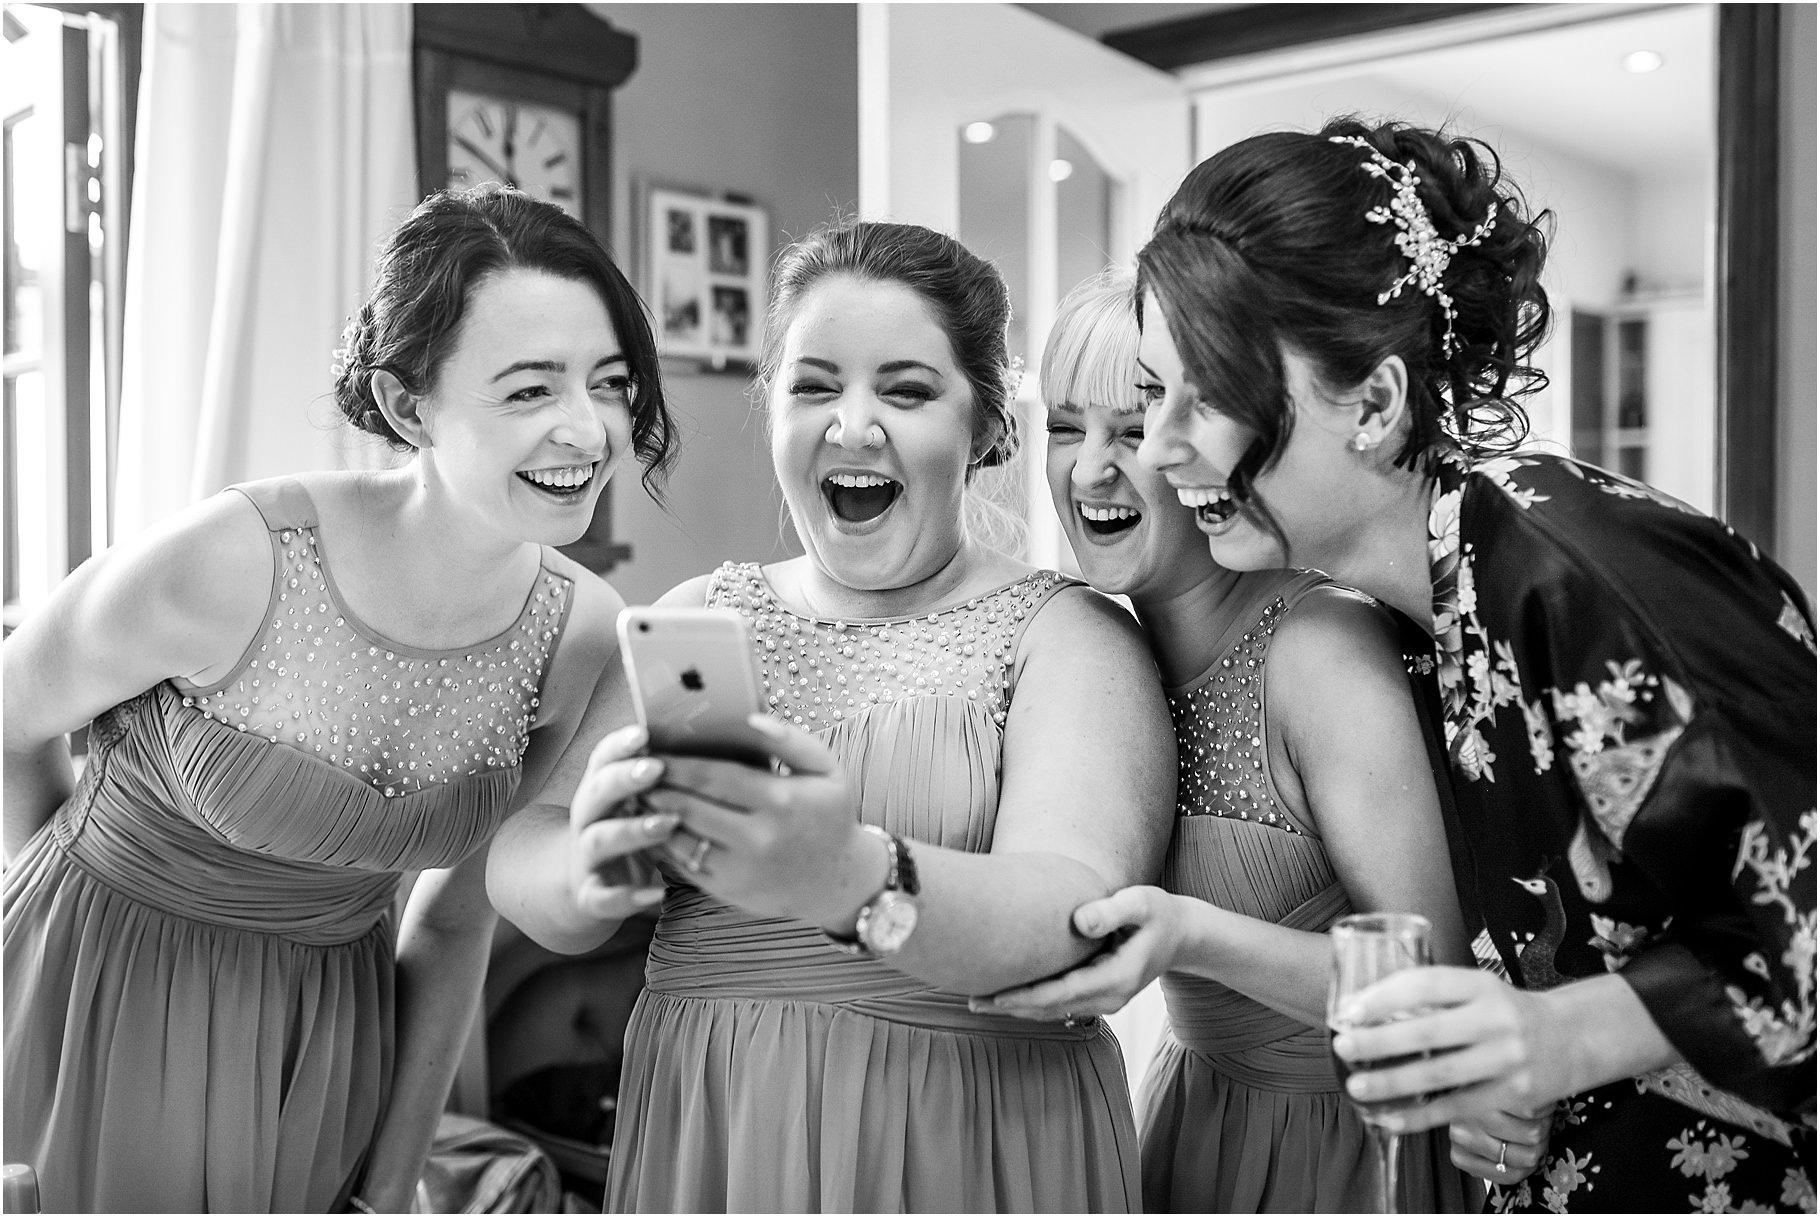 dan-wootton-photography-2017-weddings-019.jpg